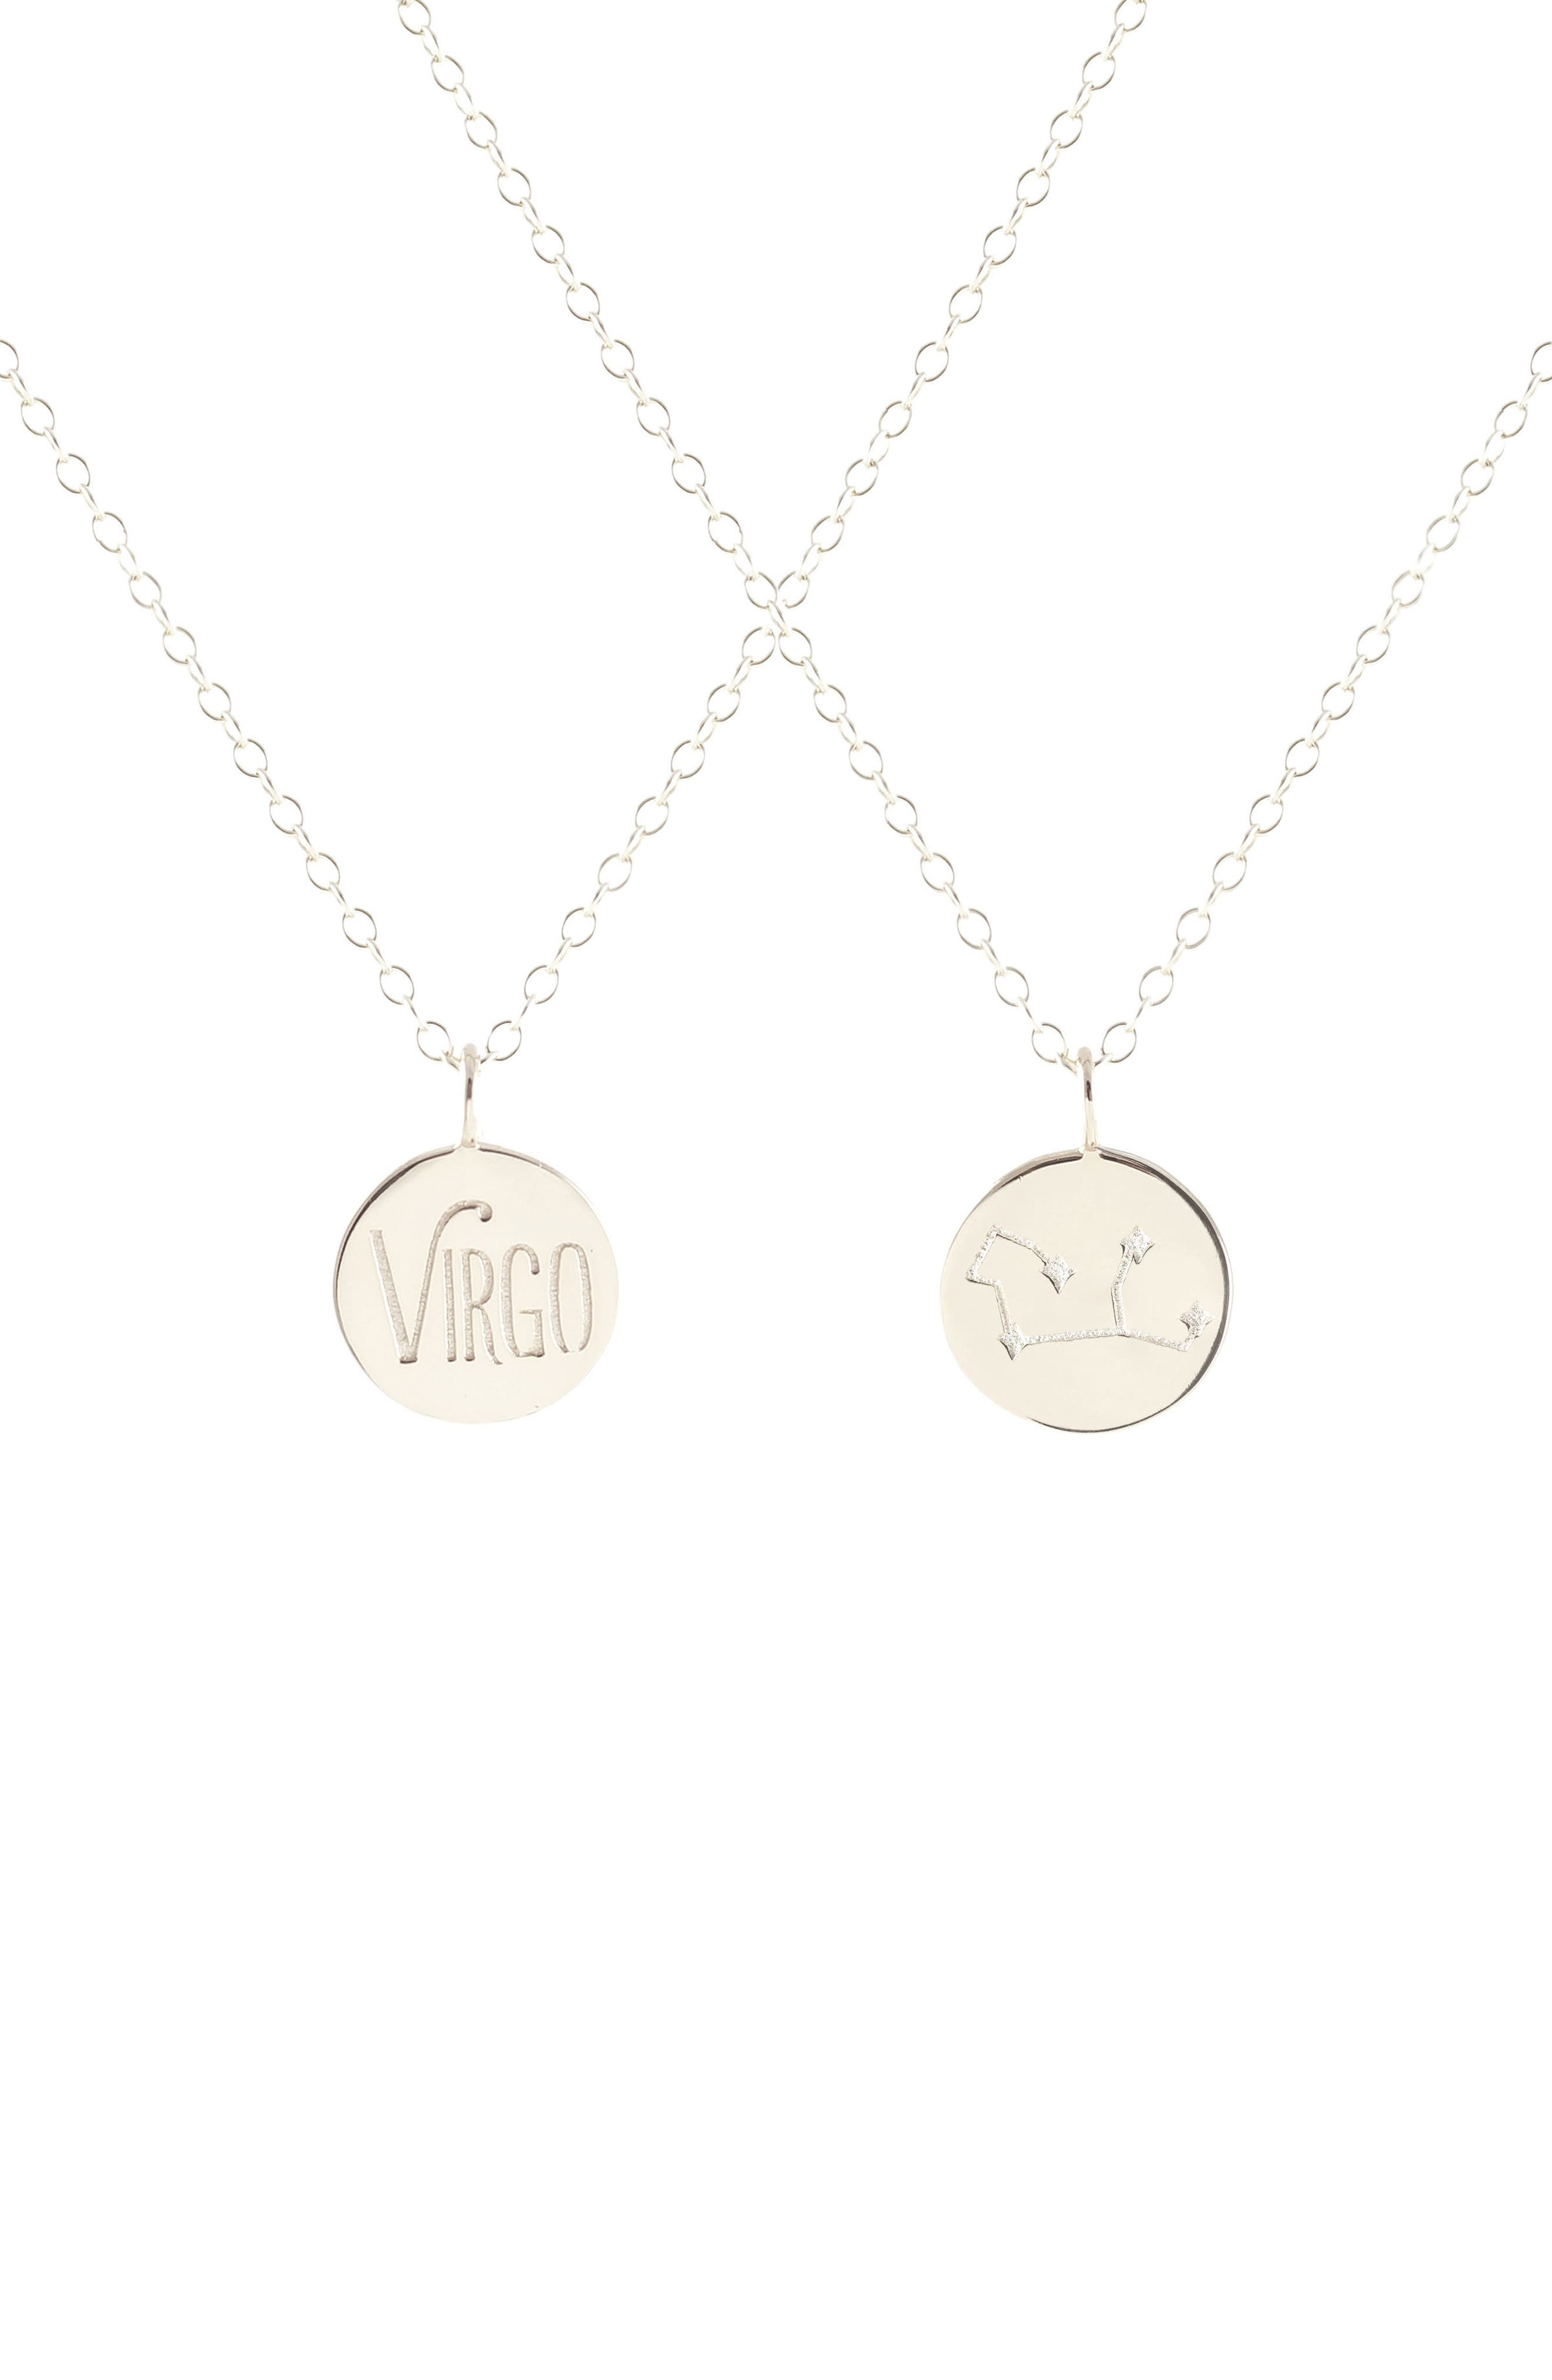 Zodiac Charm Necklace,                             Main thumbnail 1, color,                             Virgo - Silver